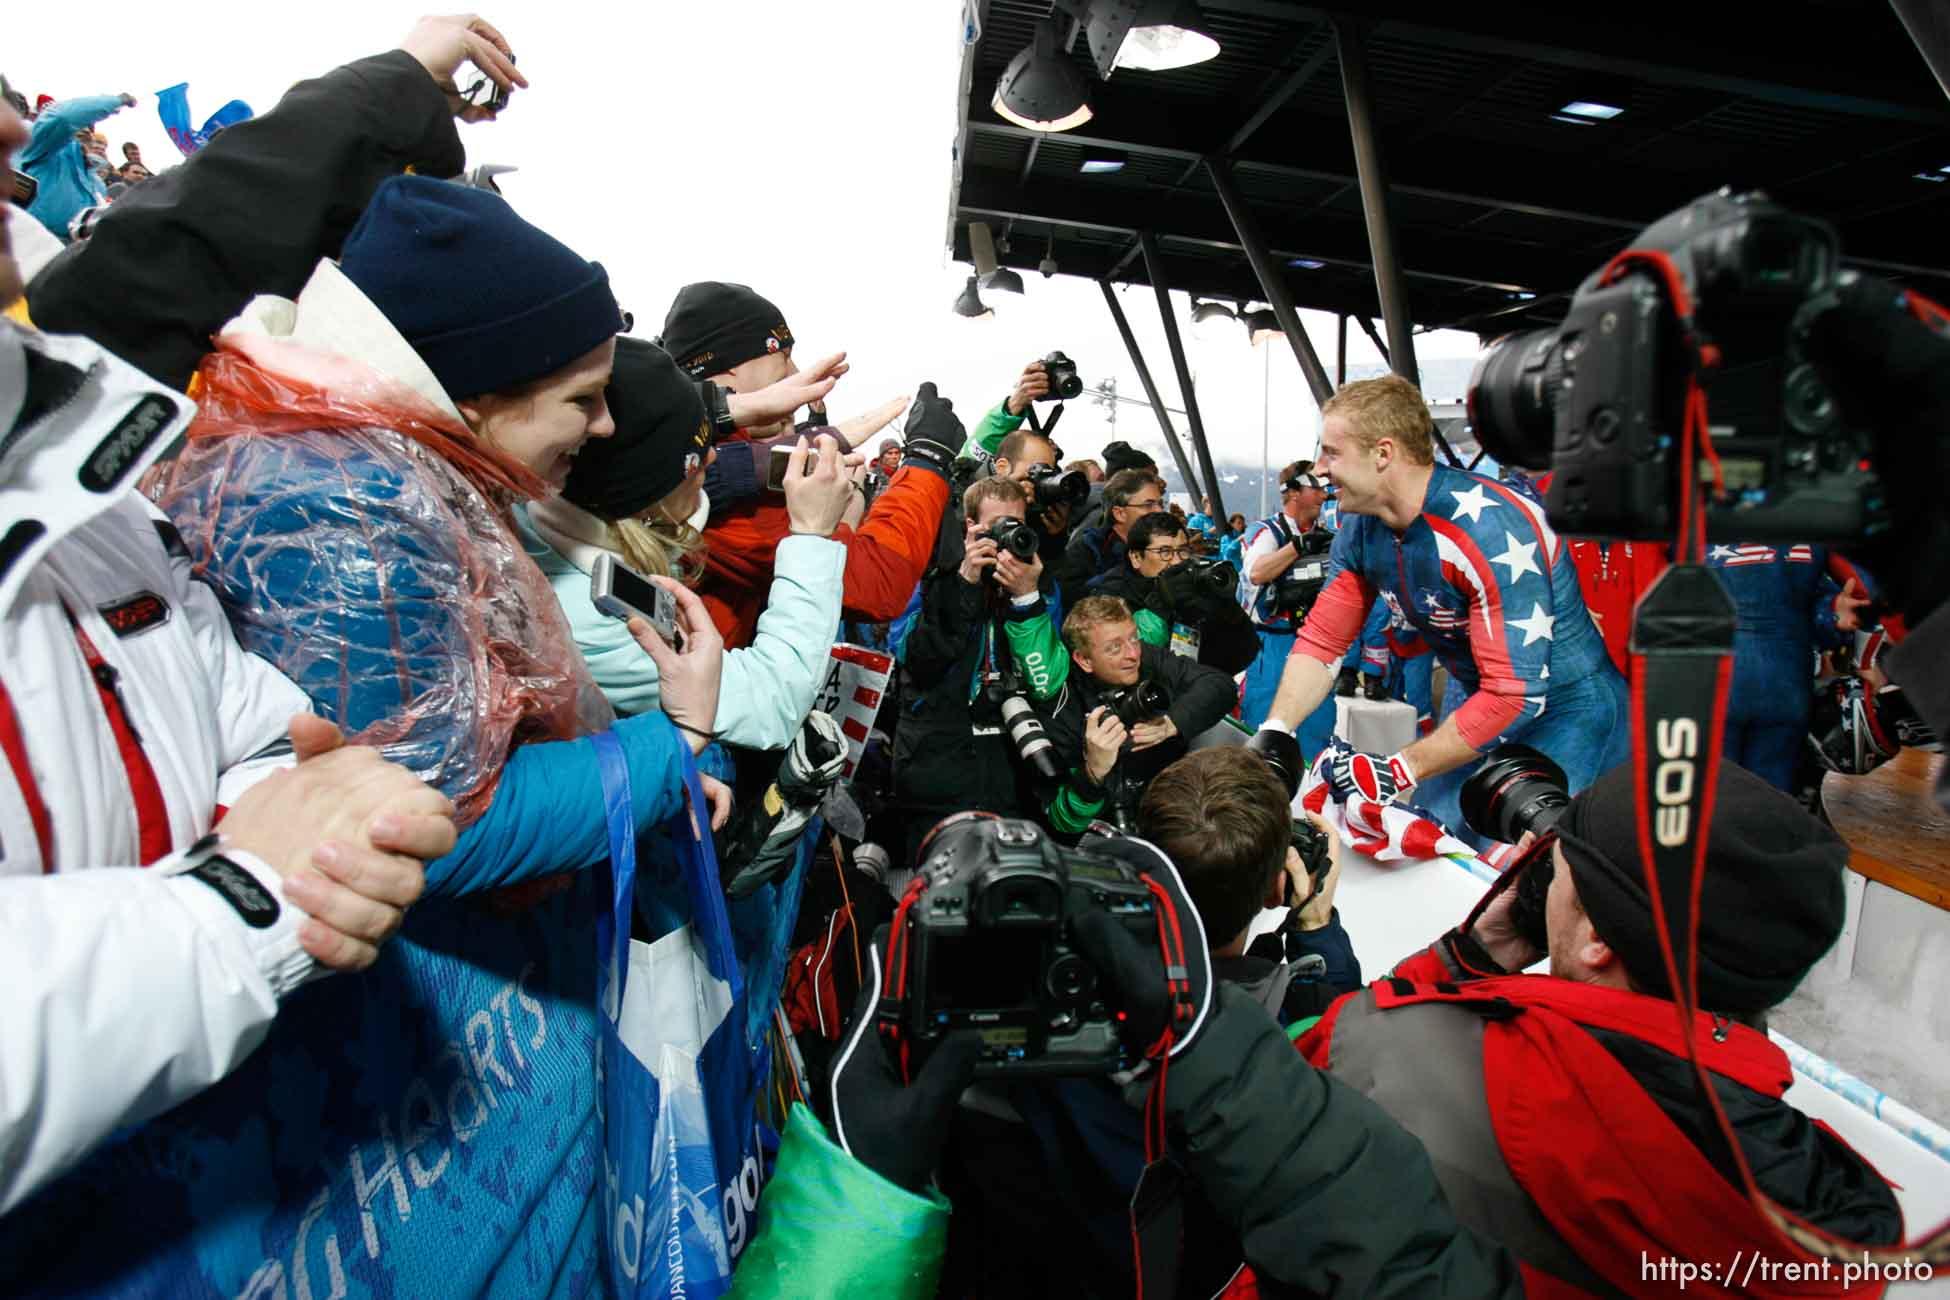 Trent Nelson | The Salt Lake Tribune 4-Man Bobsled, XXI Olympic Winter Games, Saturday, February 27, 2010. usa1 wins gold medal. steven holcomb, steve mesler, curtis tomasevicz, justin olsen